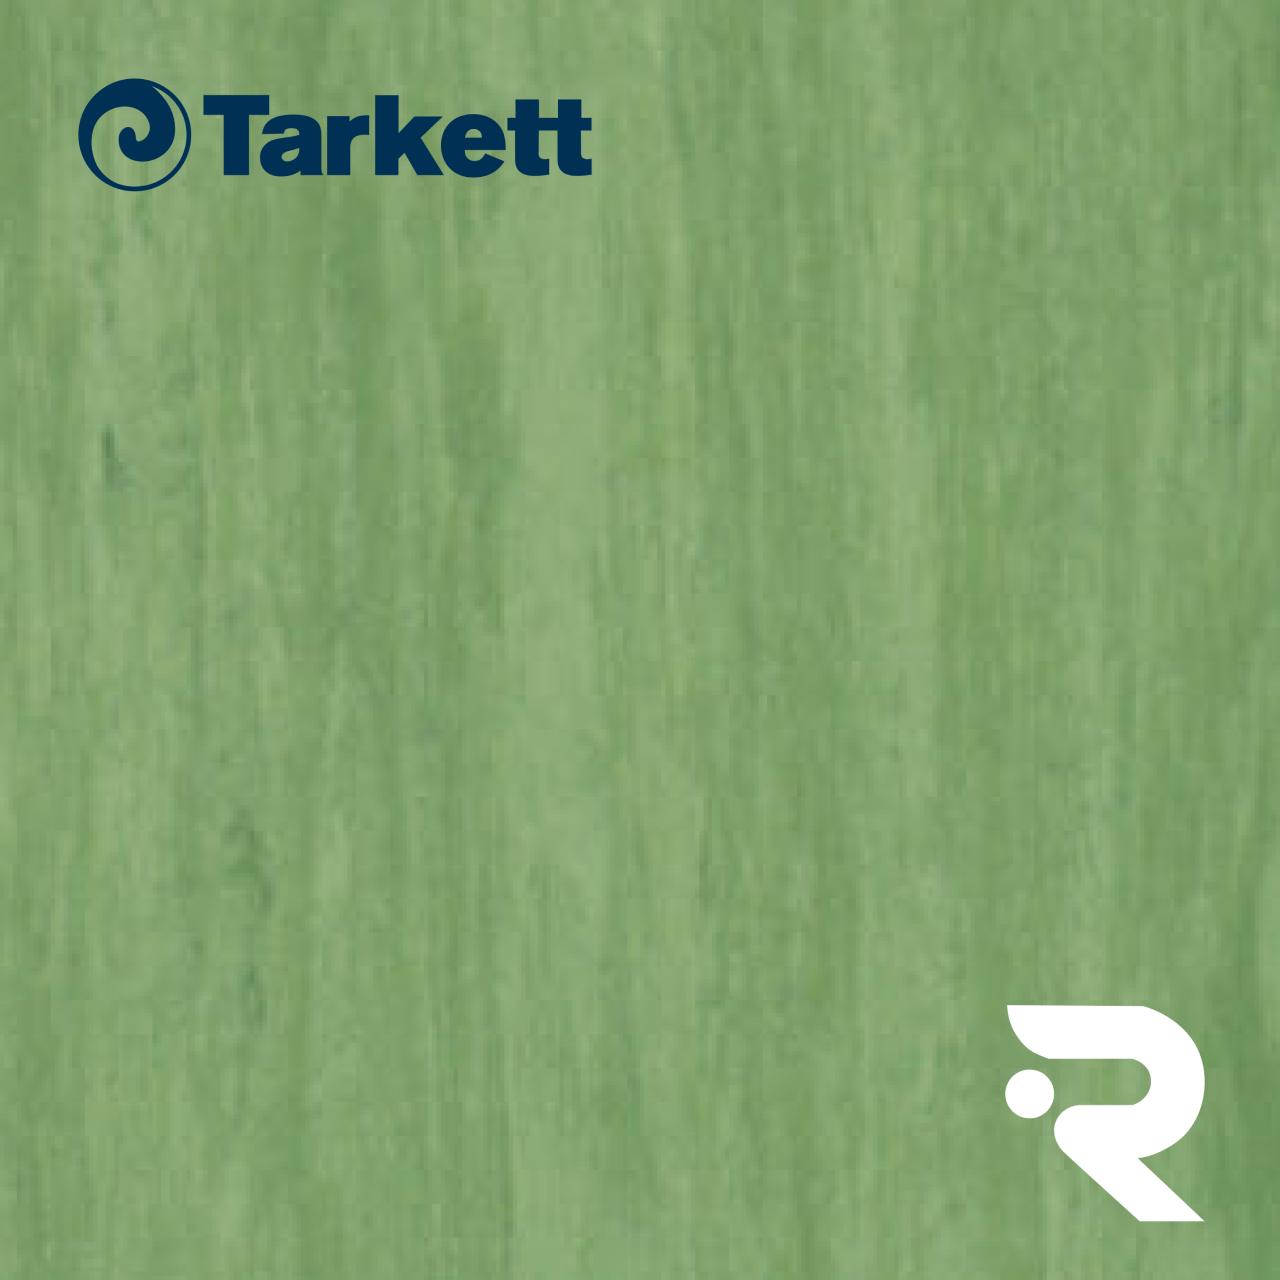 🏫 Гомогенный линолеум Tarkett | Standard DARK GREEN 0921 | Standard Plus 2.0 mm | 610 х 610 мм